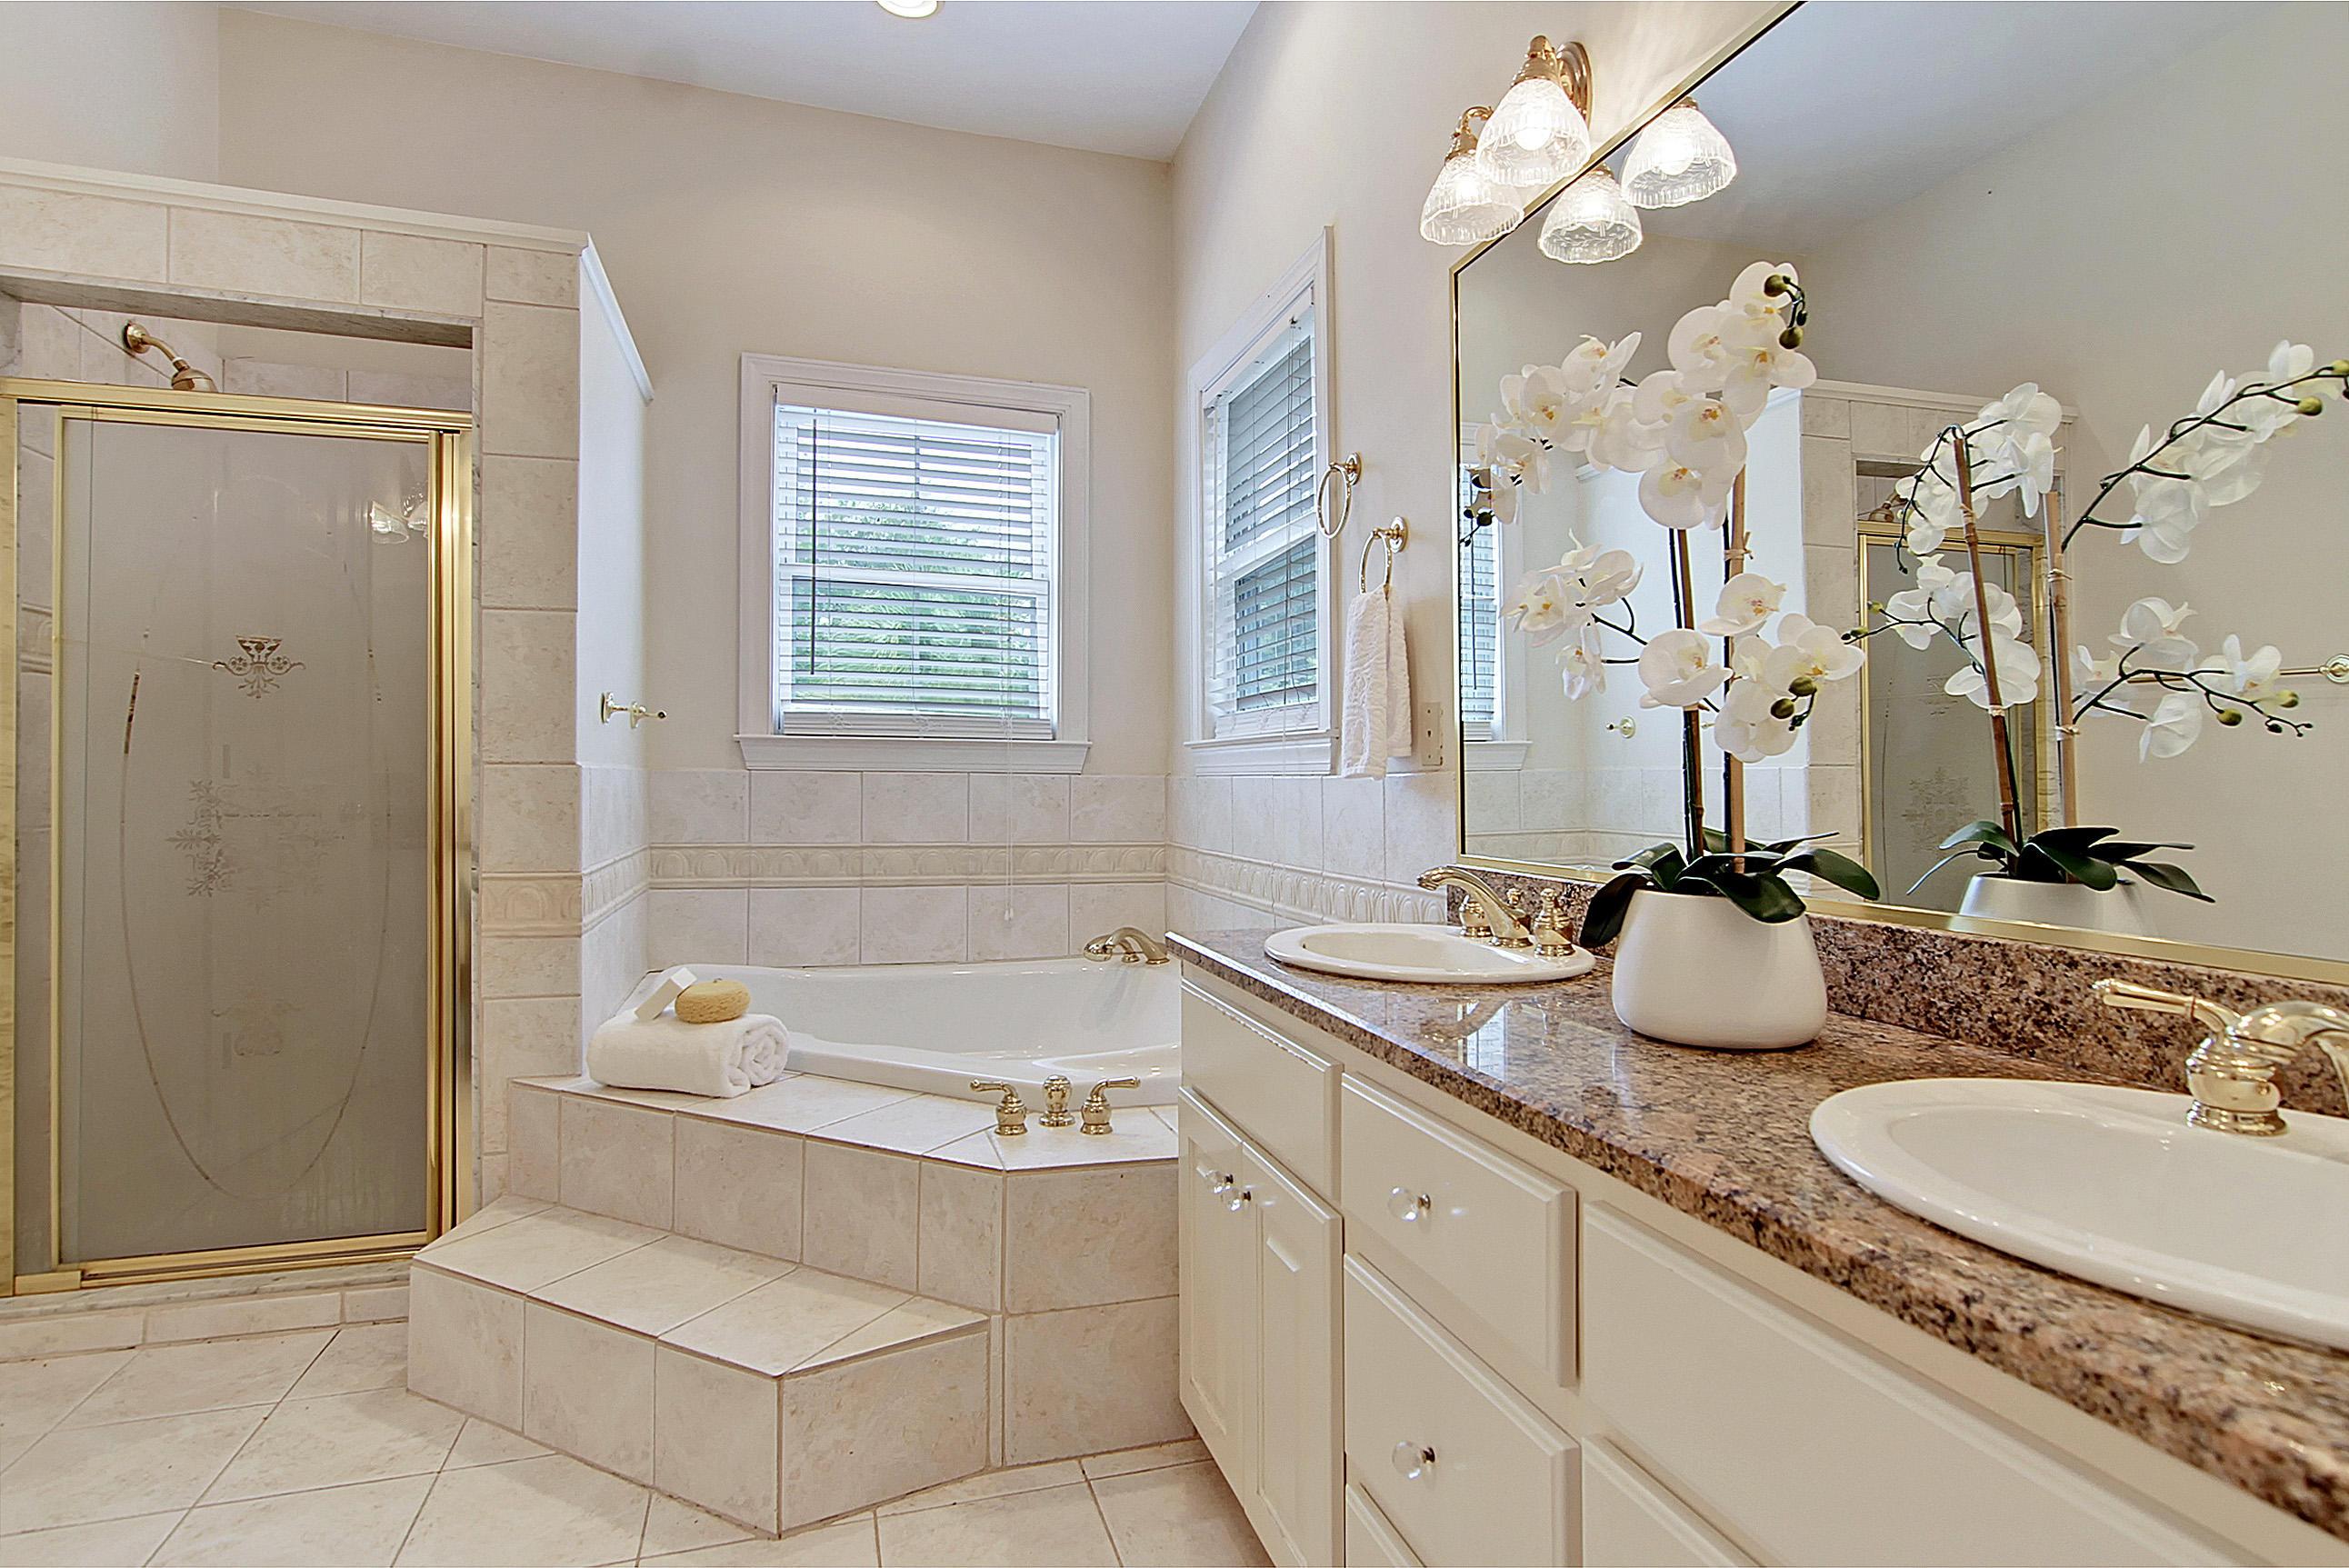 Wagener Terrace Homes For Sale - 136 Darlington, Charleston, SC - 9